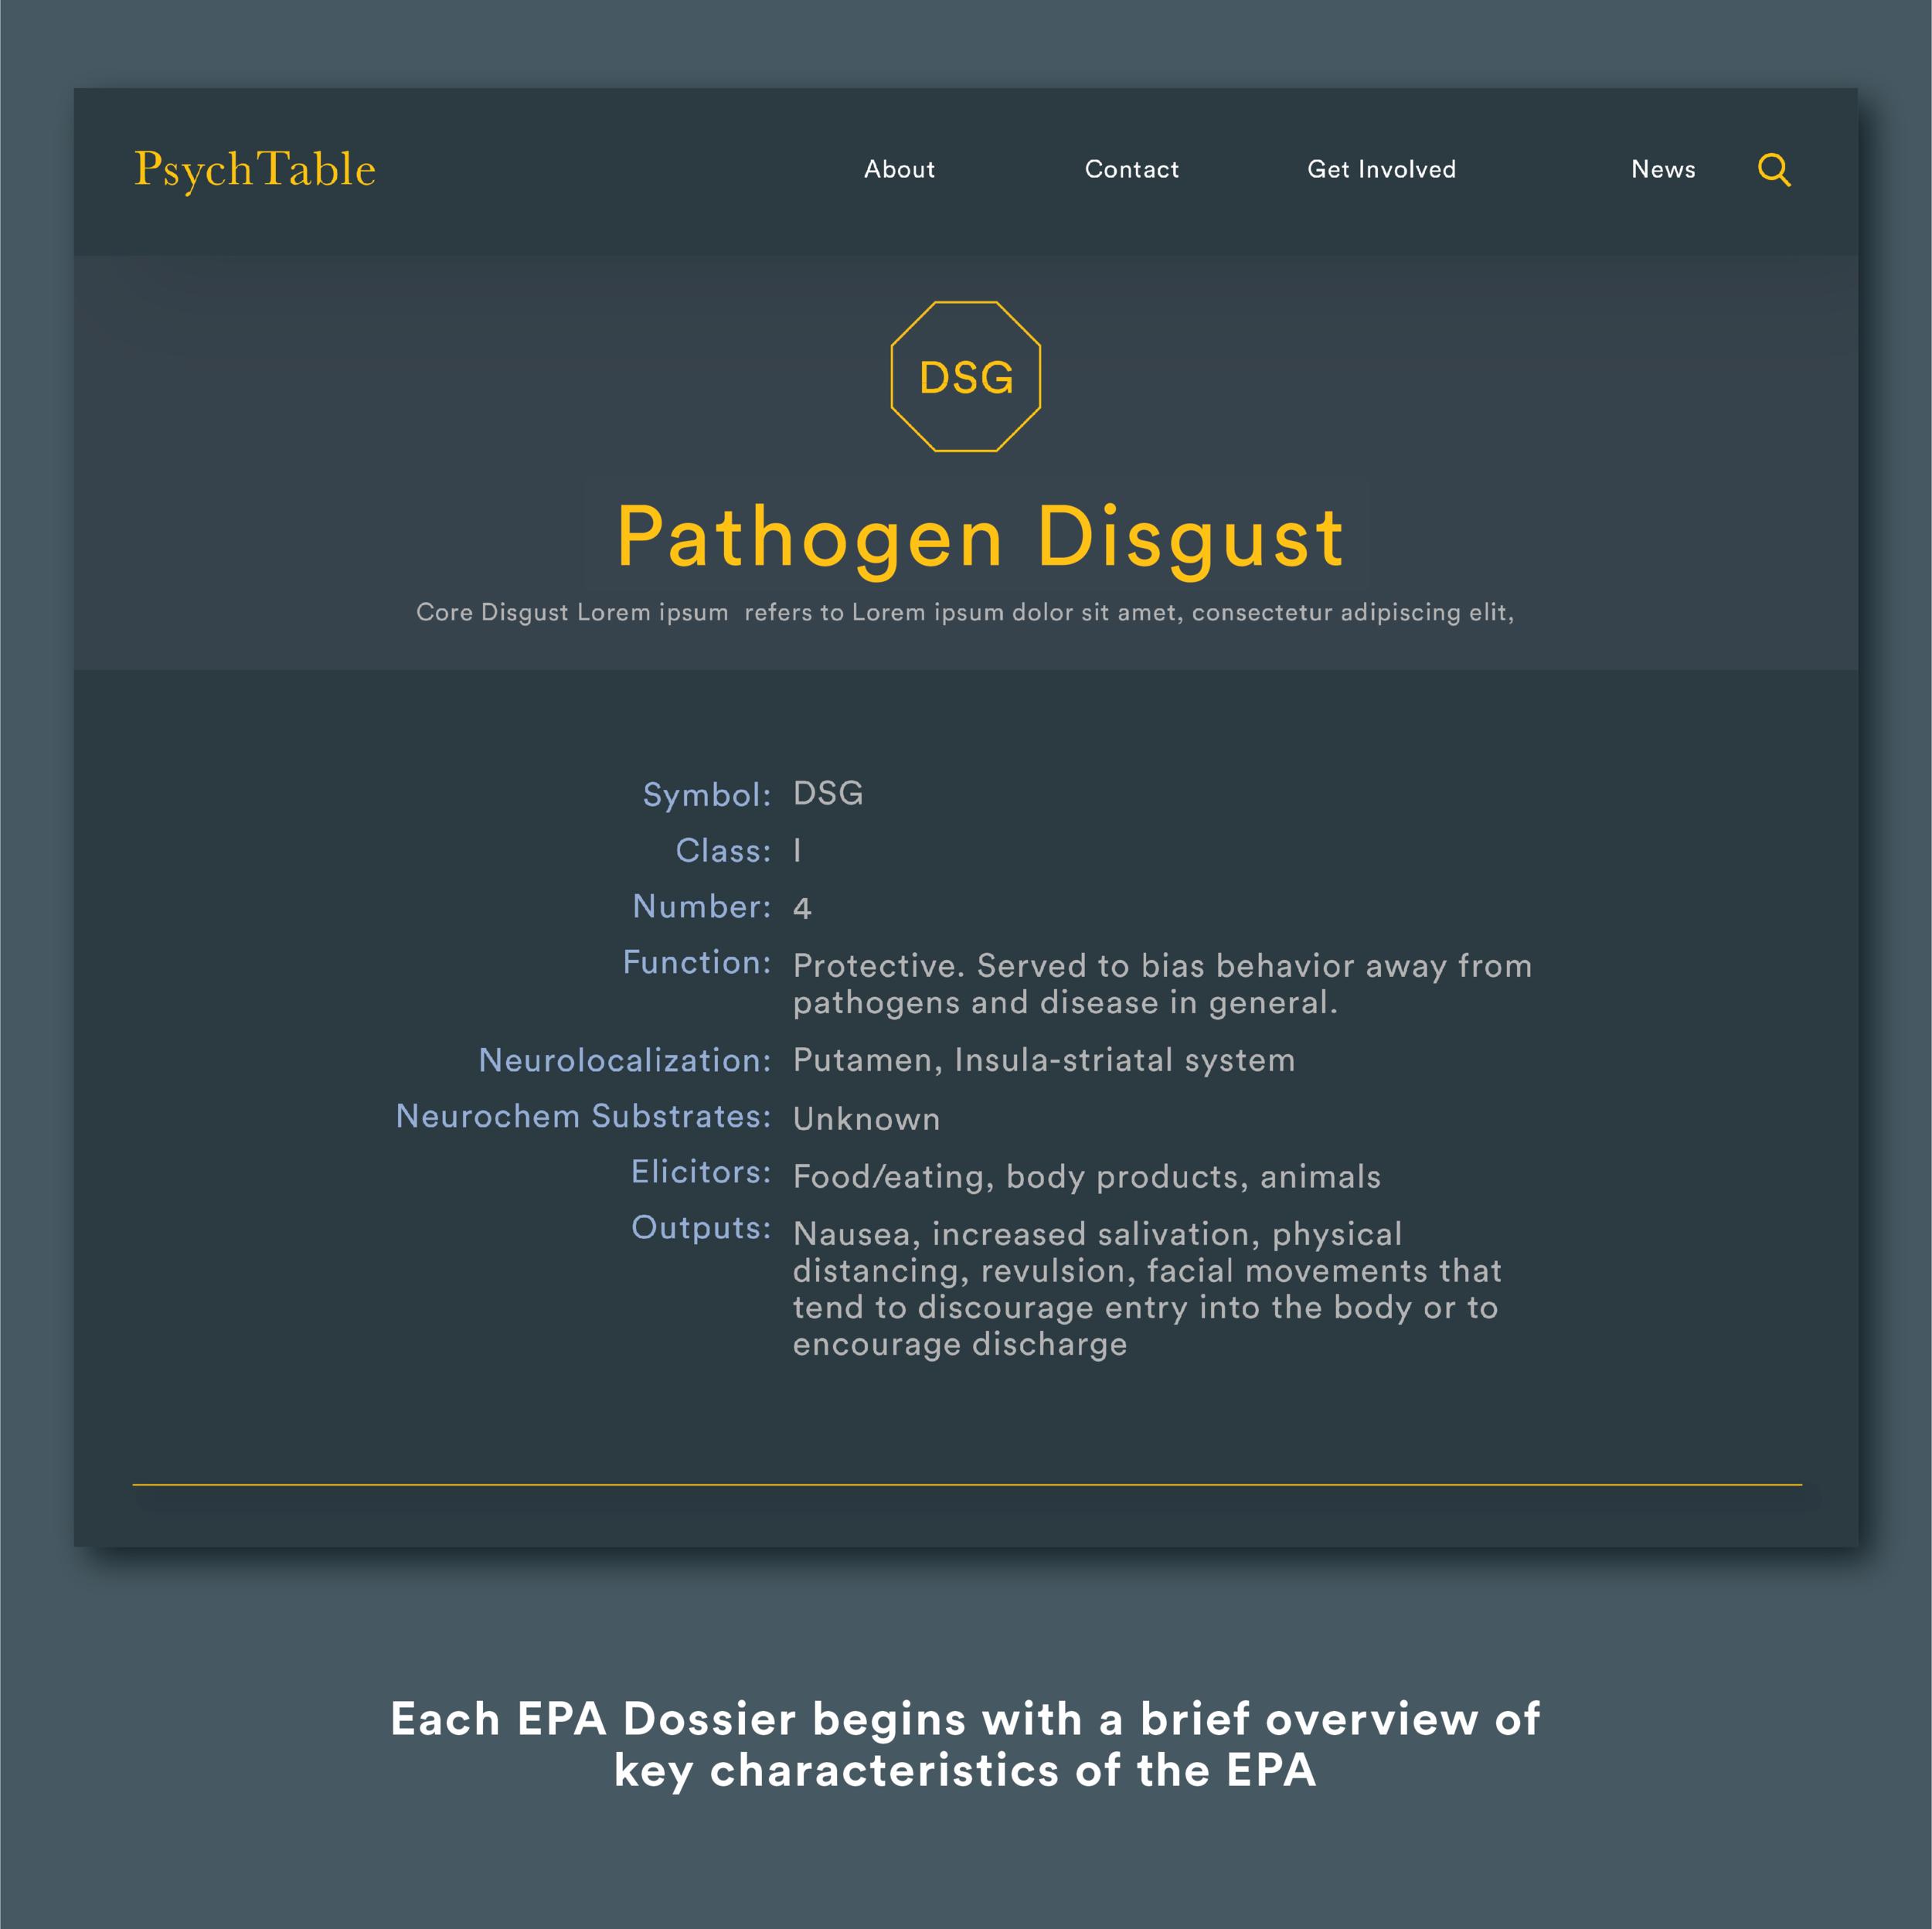 EPA_Dossier_1_NEW.png